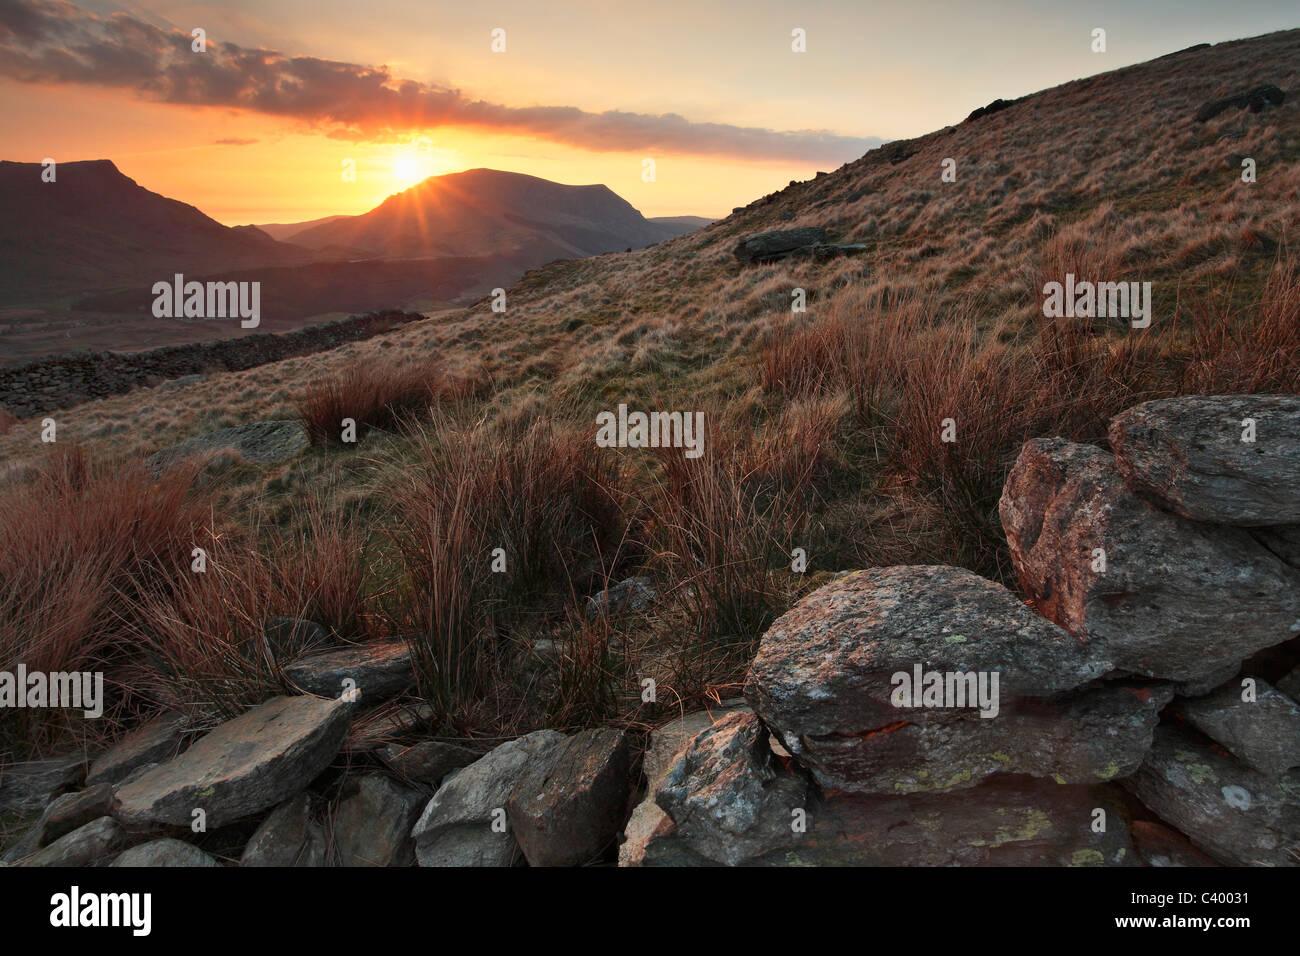 Soleil se couche derrière Craig mcg Silyn vu depuis le chemin d'Anglesey Rhyd Ddu dans près de Gwynedd, Photo Stock